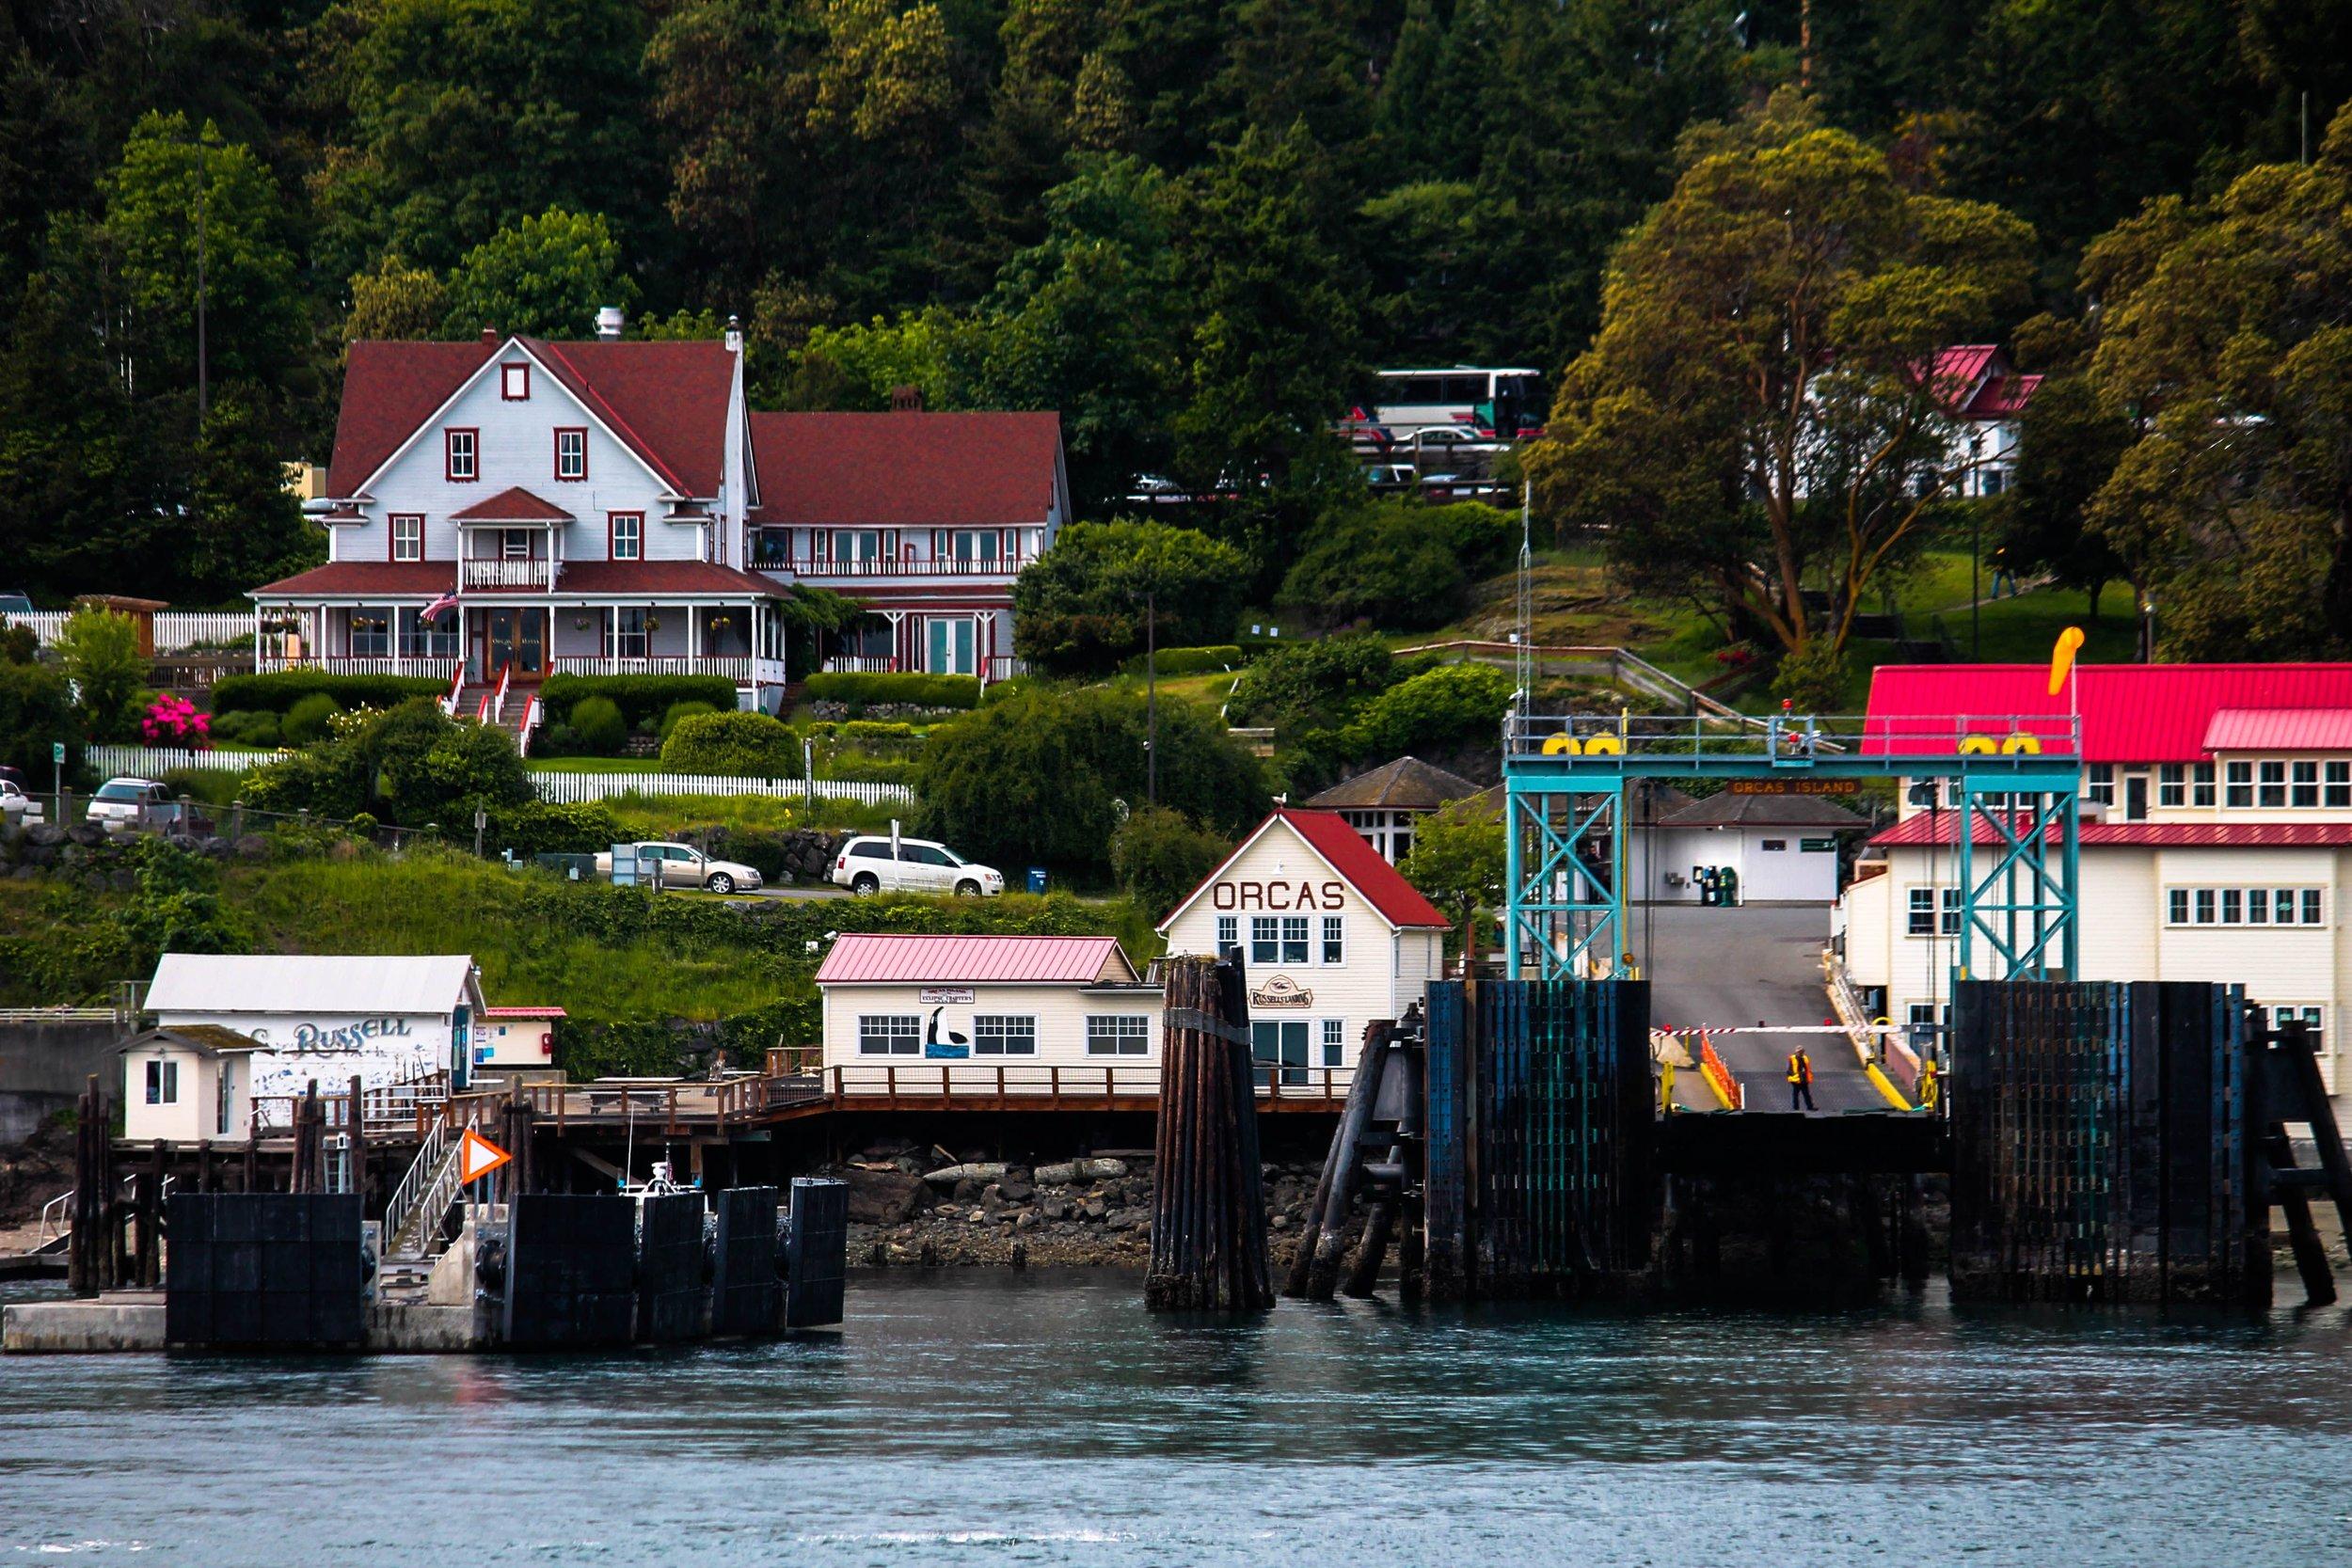 Orcas_Island-56a359c93df78cf7727ceecc.jpg